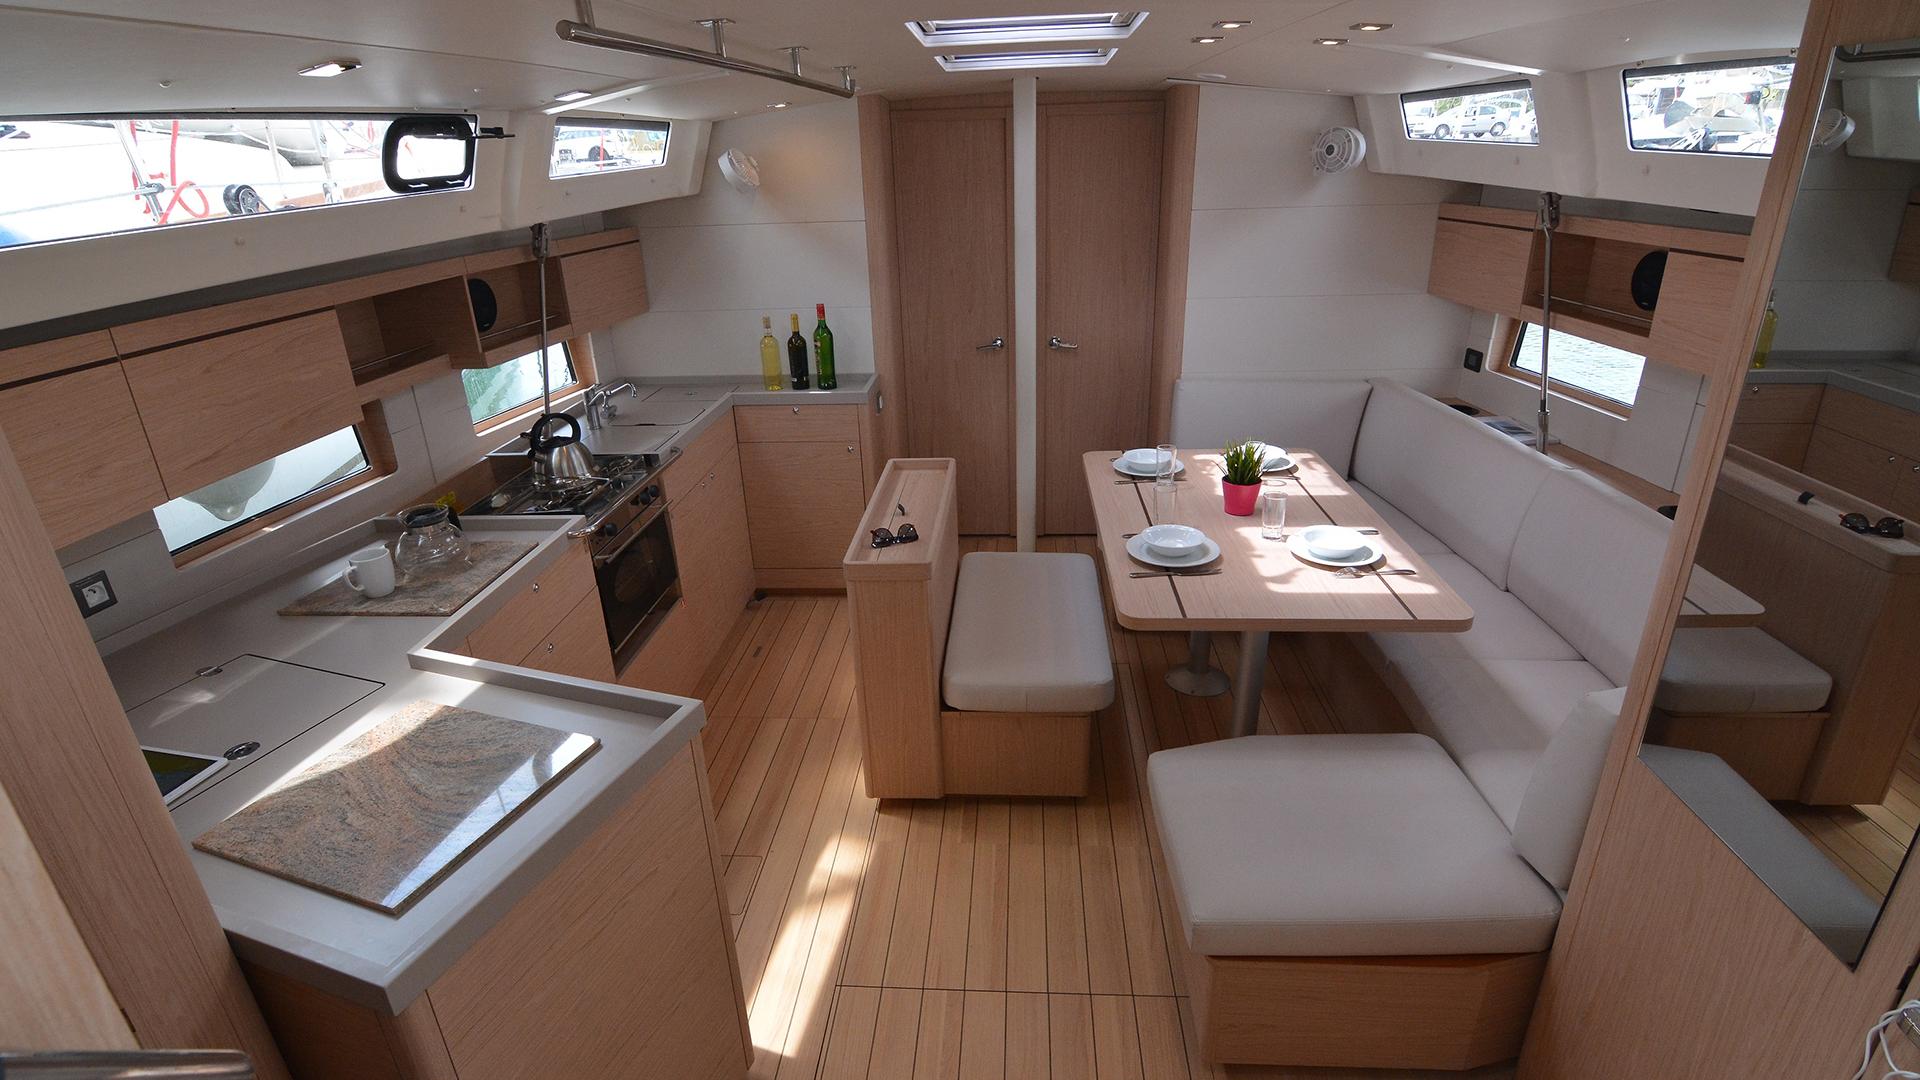 Oceanis 46.1 Living area